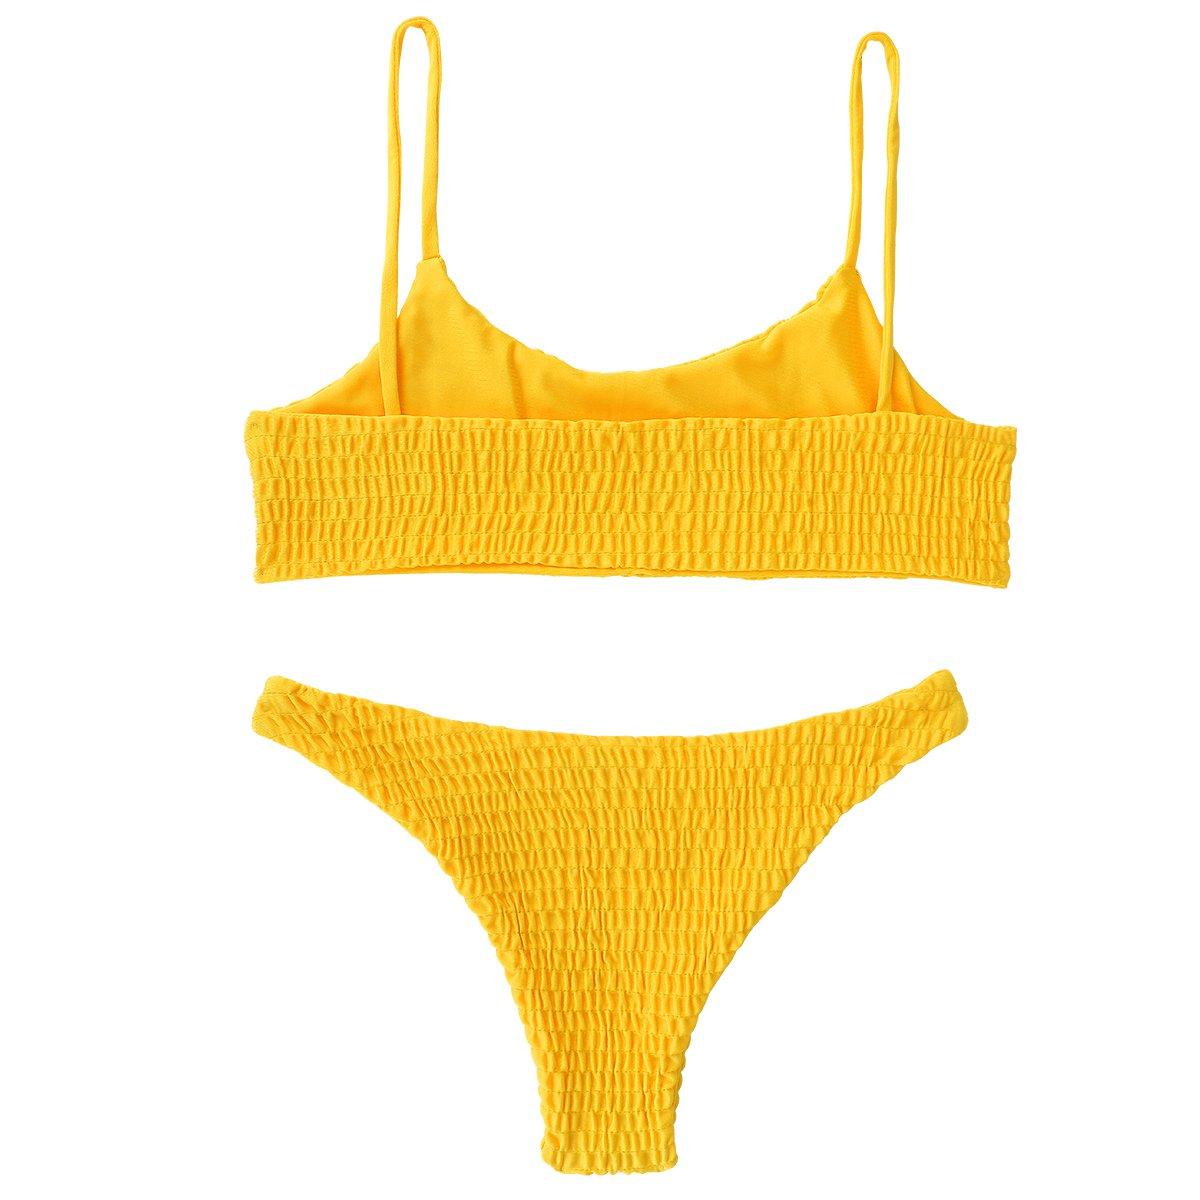 QEETUNG Women\'s Bikini Two Piece Solid Color Sexy Pleated Triangle Swimsuit Bikini Sets Beachwear Top Bottom Set (Yellow, M(US 2-4. Cup Size: B-C))